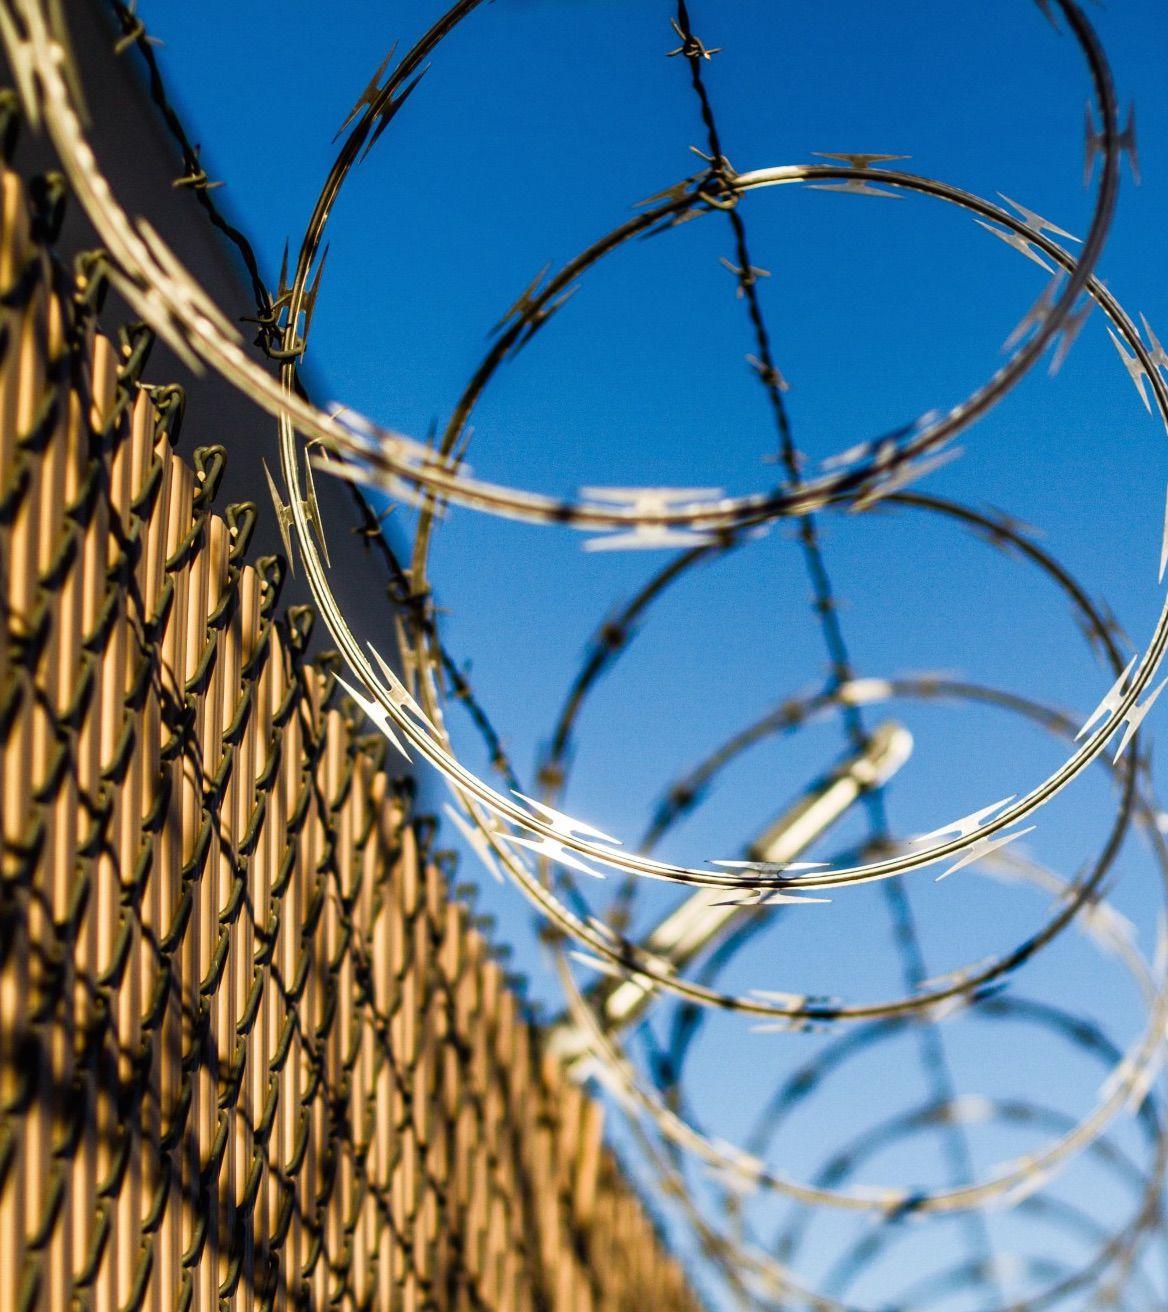 Plans proceed on repurposing old prison   Local News   athensnews.com